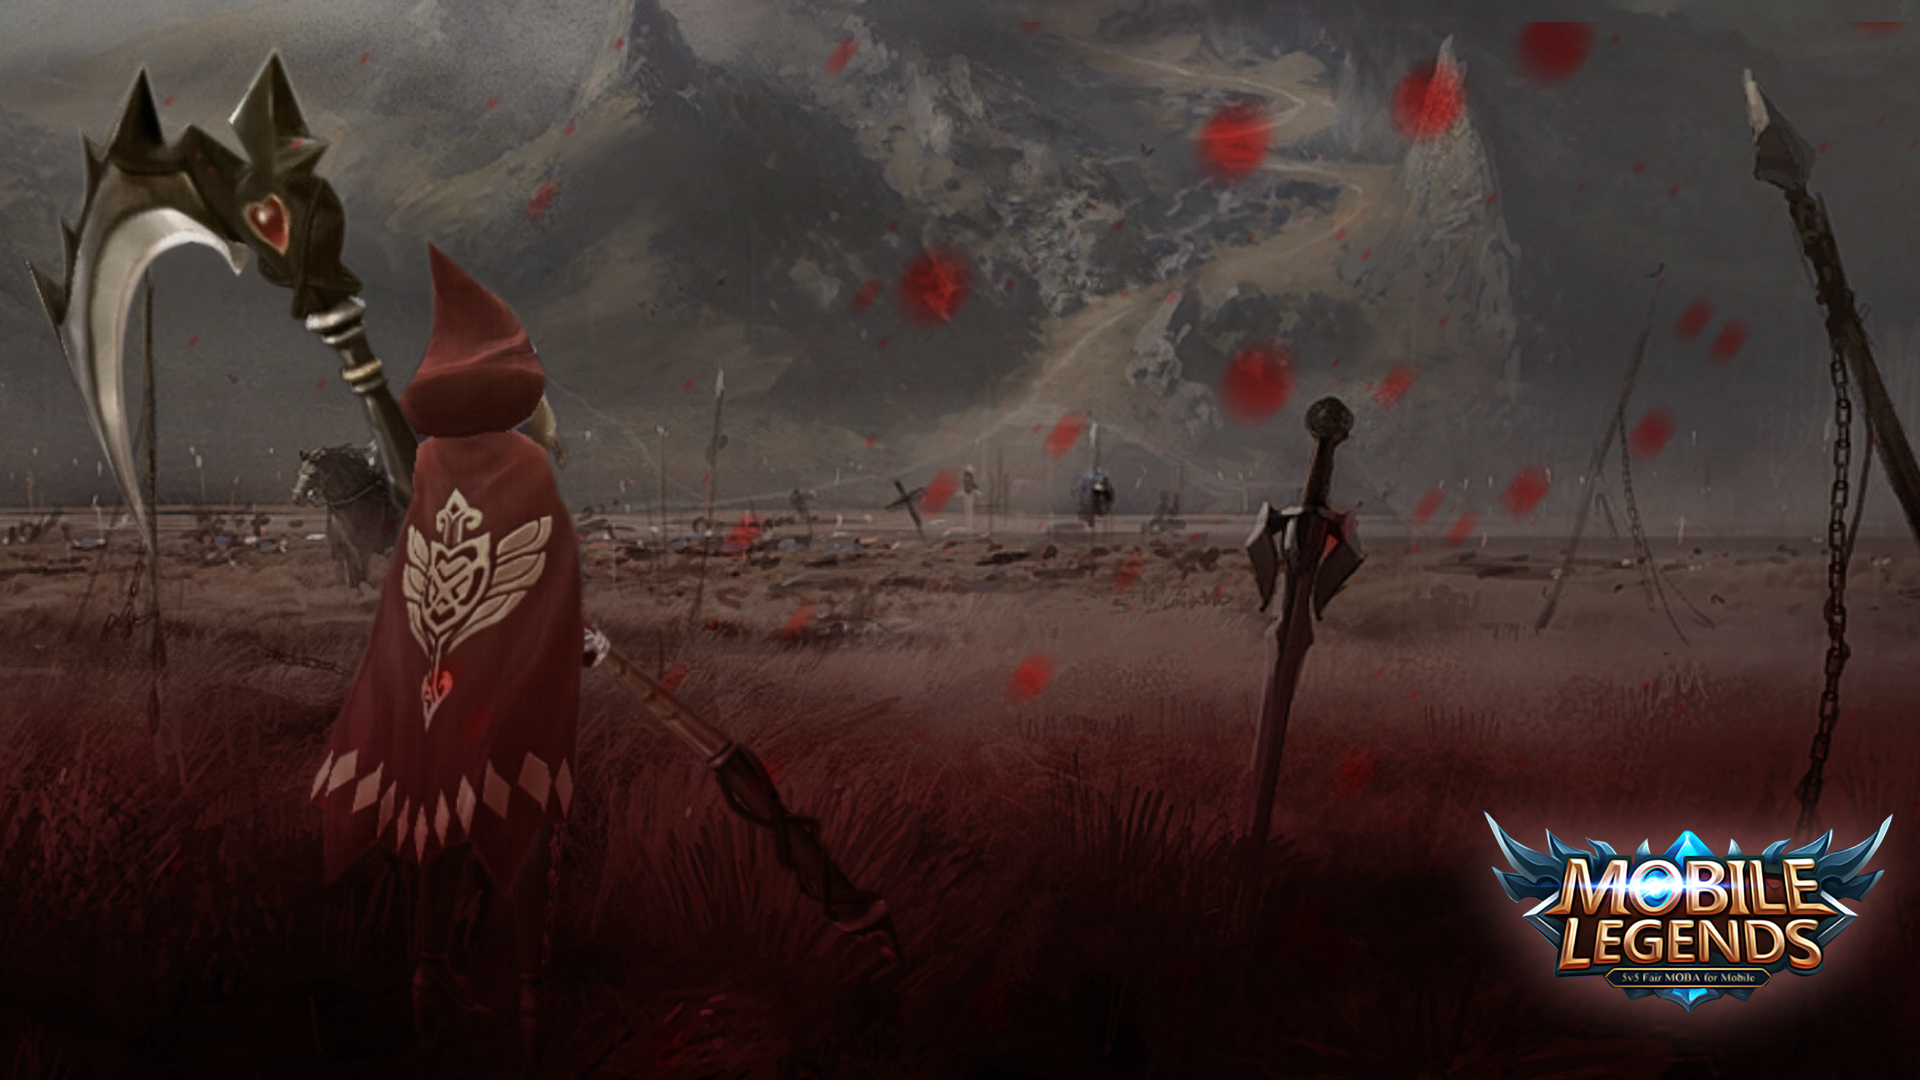 Ruby Wallpaper Mobile Legends By Eddydsn On DeviantArt